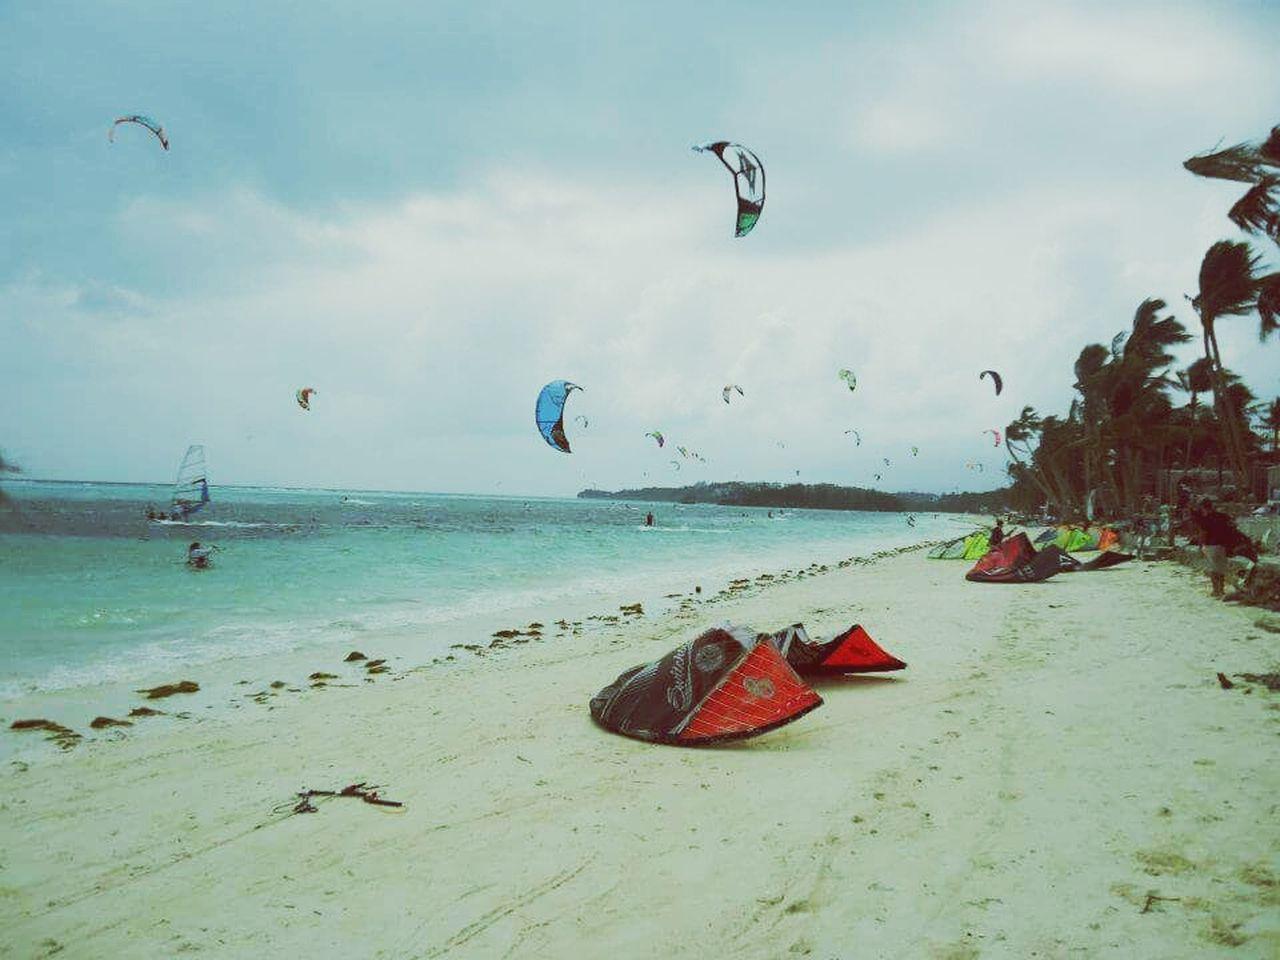 Beach Kitesurfing Sand Flying Water Summer Wave Windy Day